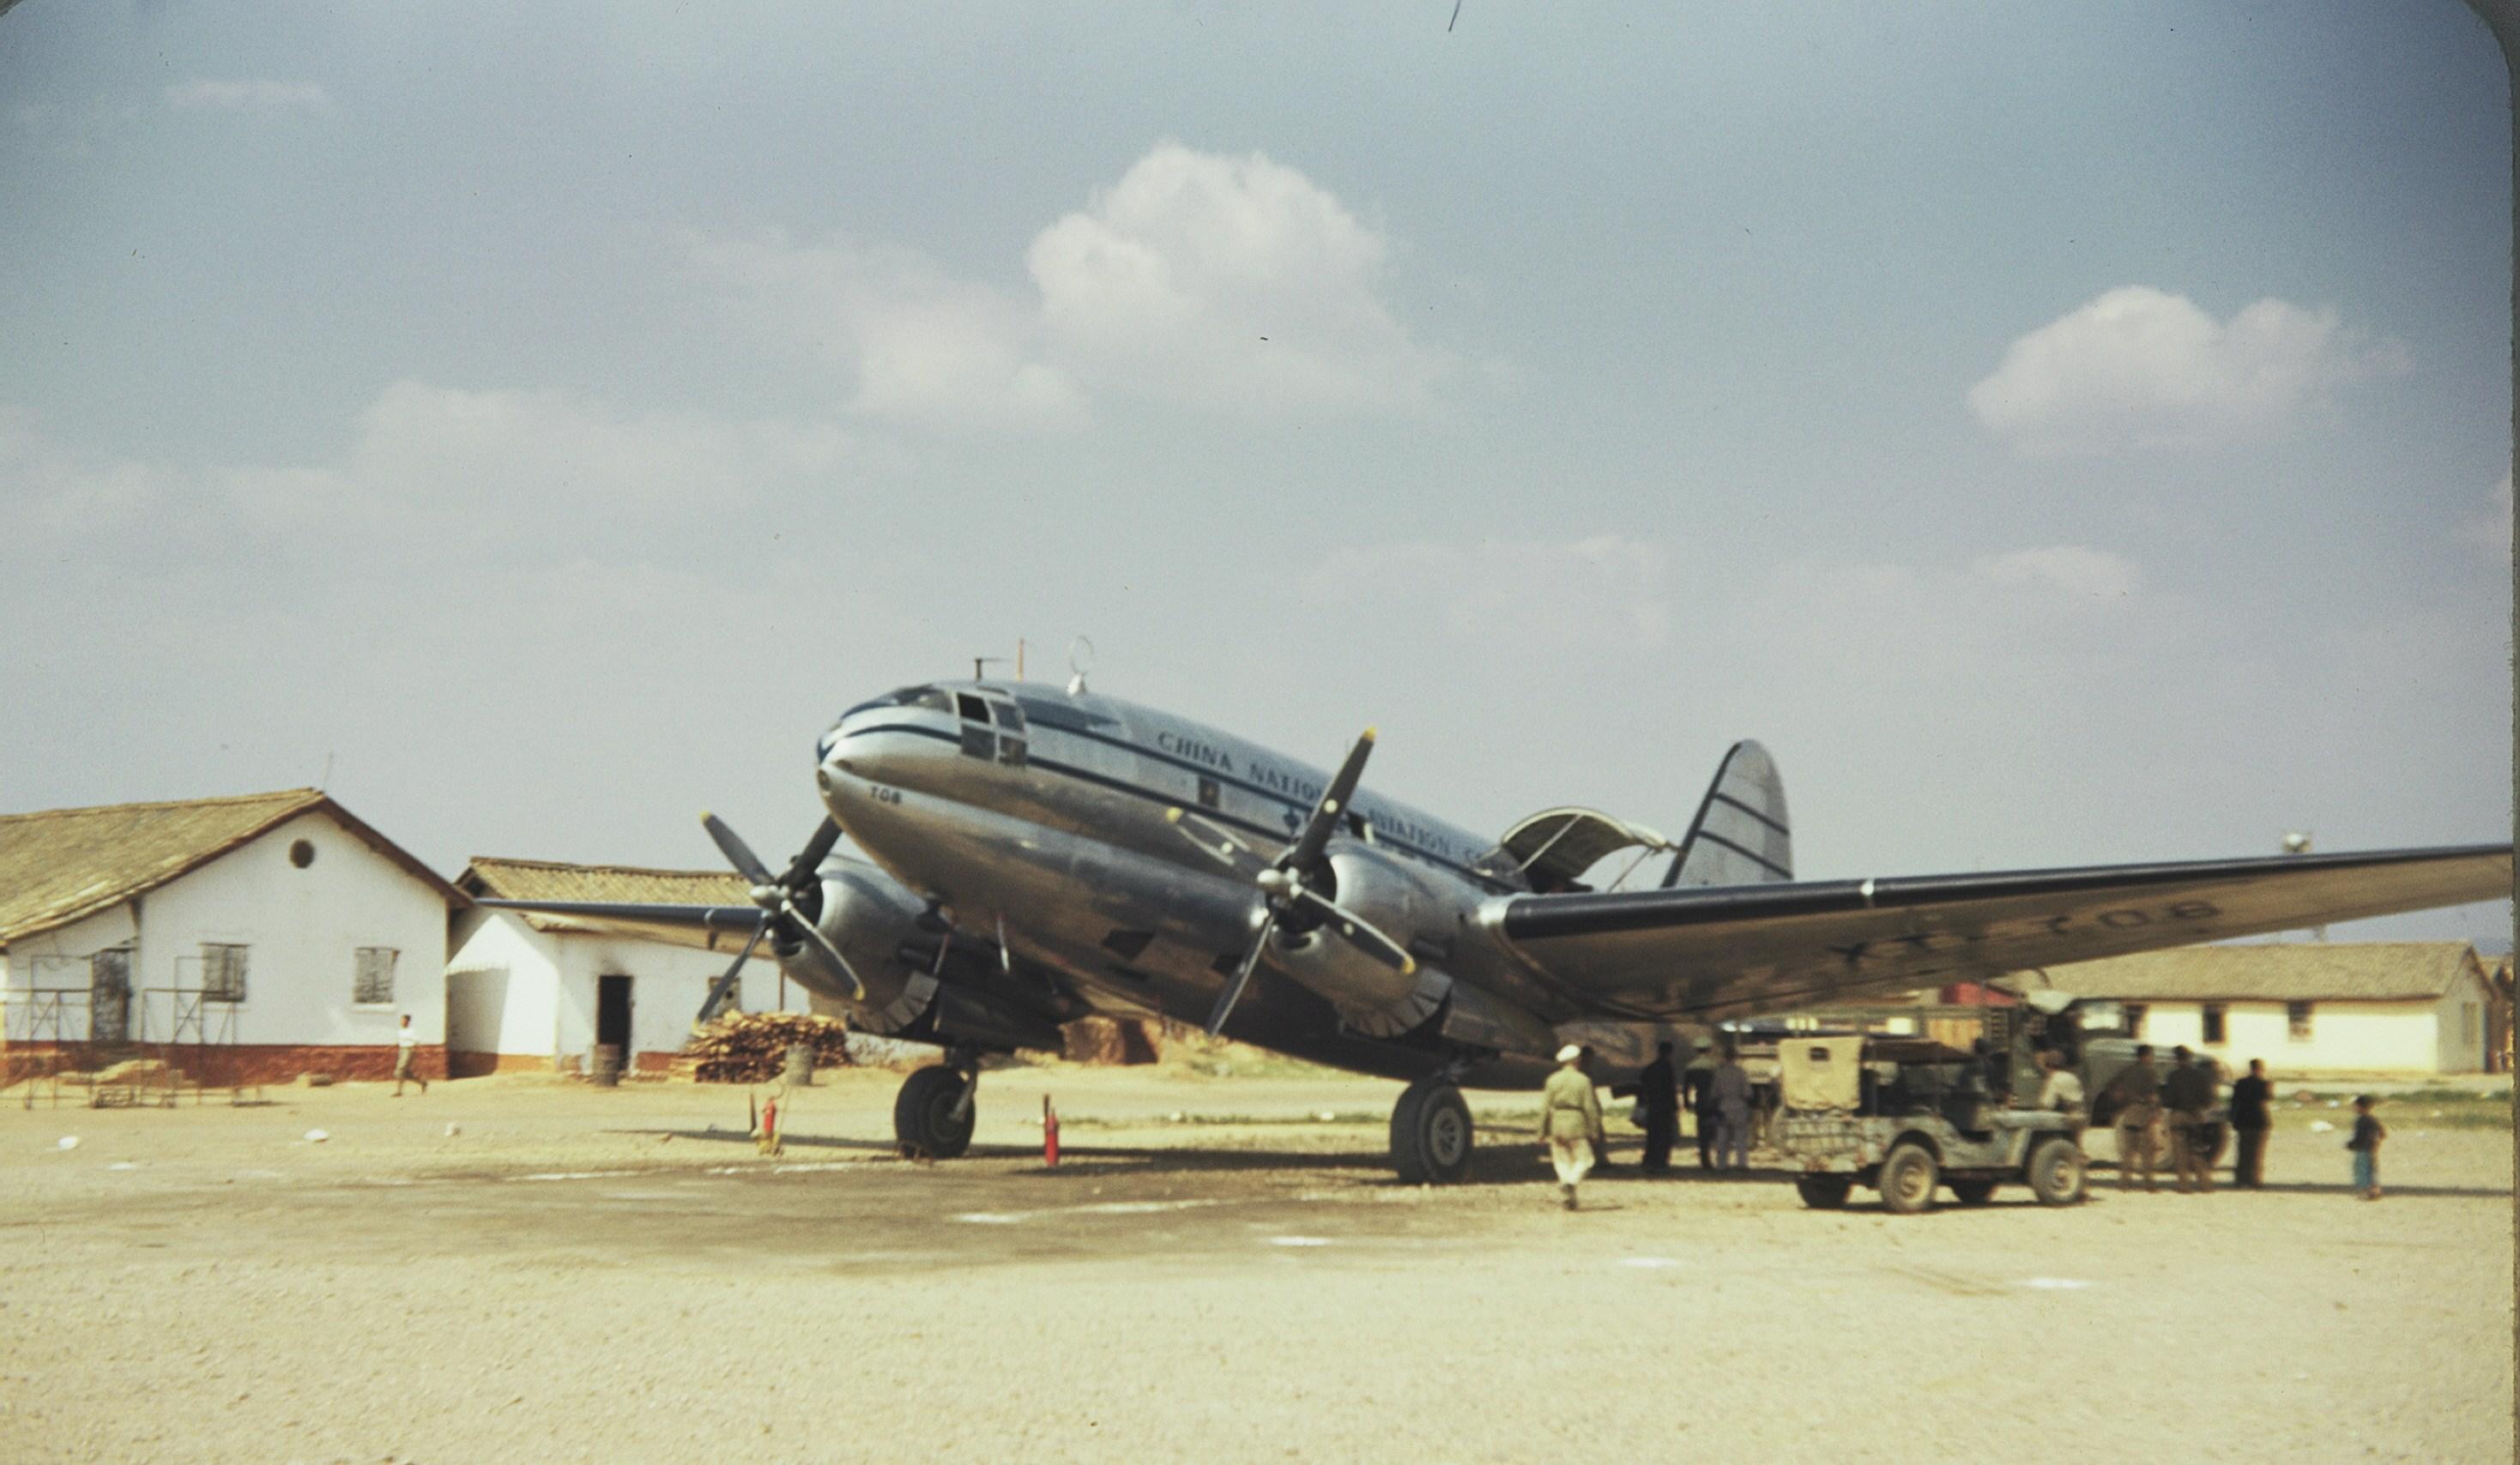 KMG-Kunming-C-46-late-1940s.jpg